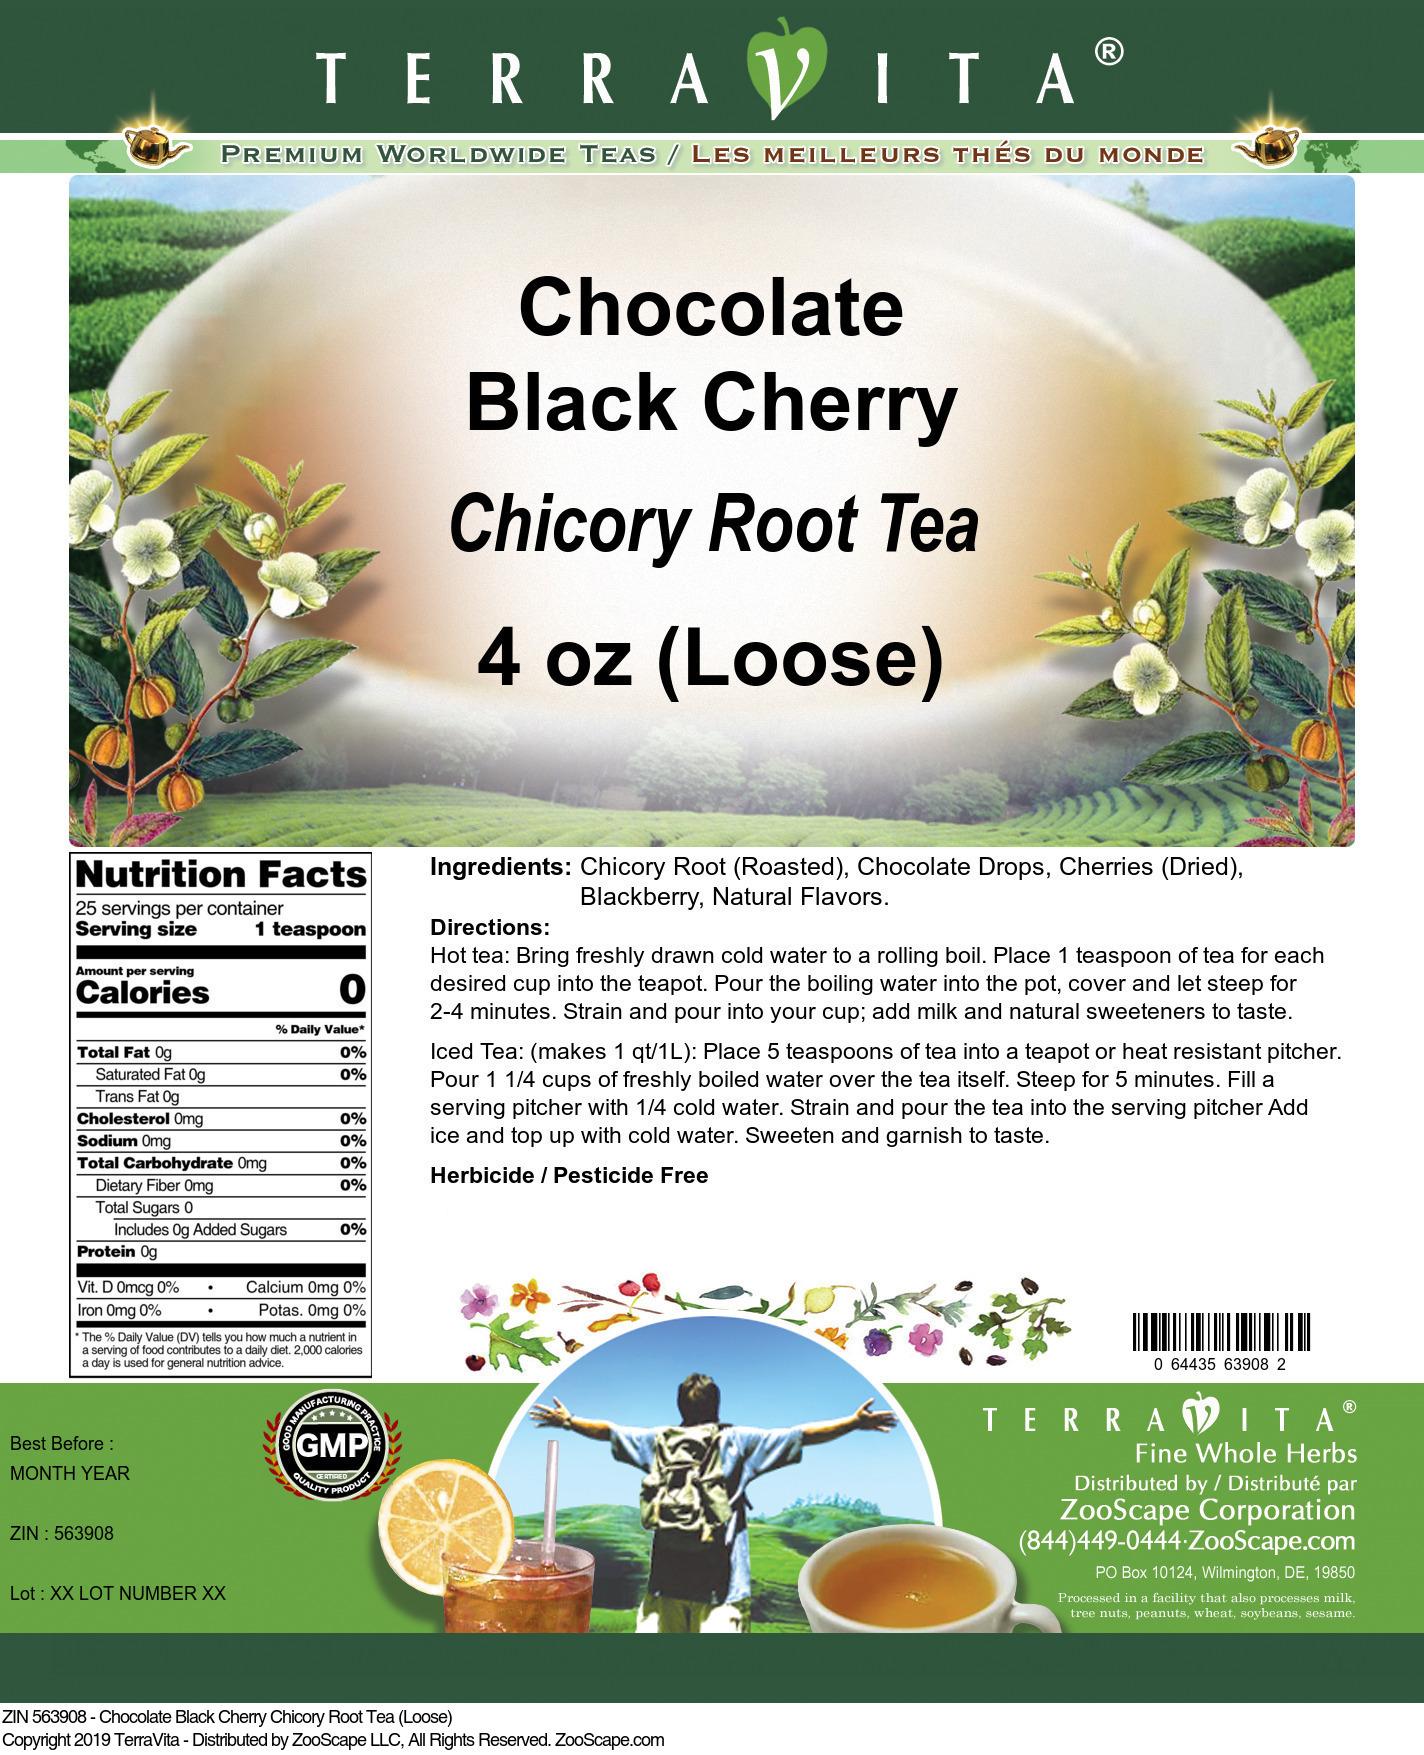 Chocolate Black Cherry Chicory Root Tea (Loose)